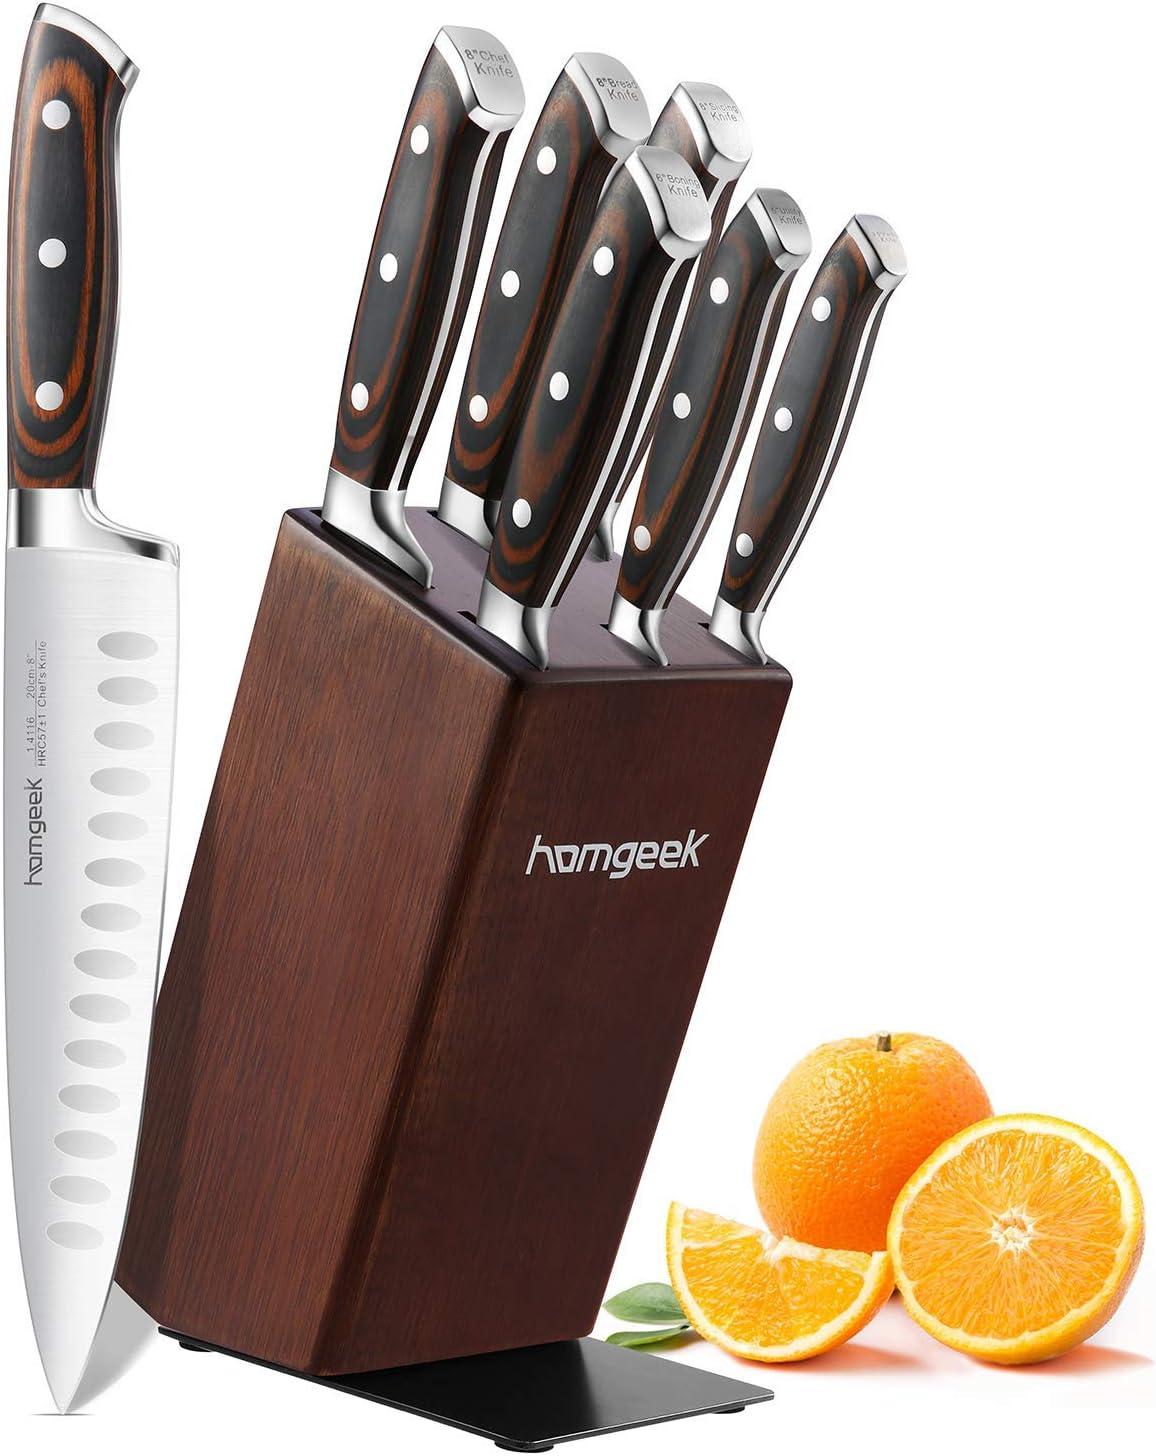 Messerblock mit Messer – Romeker